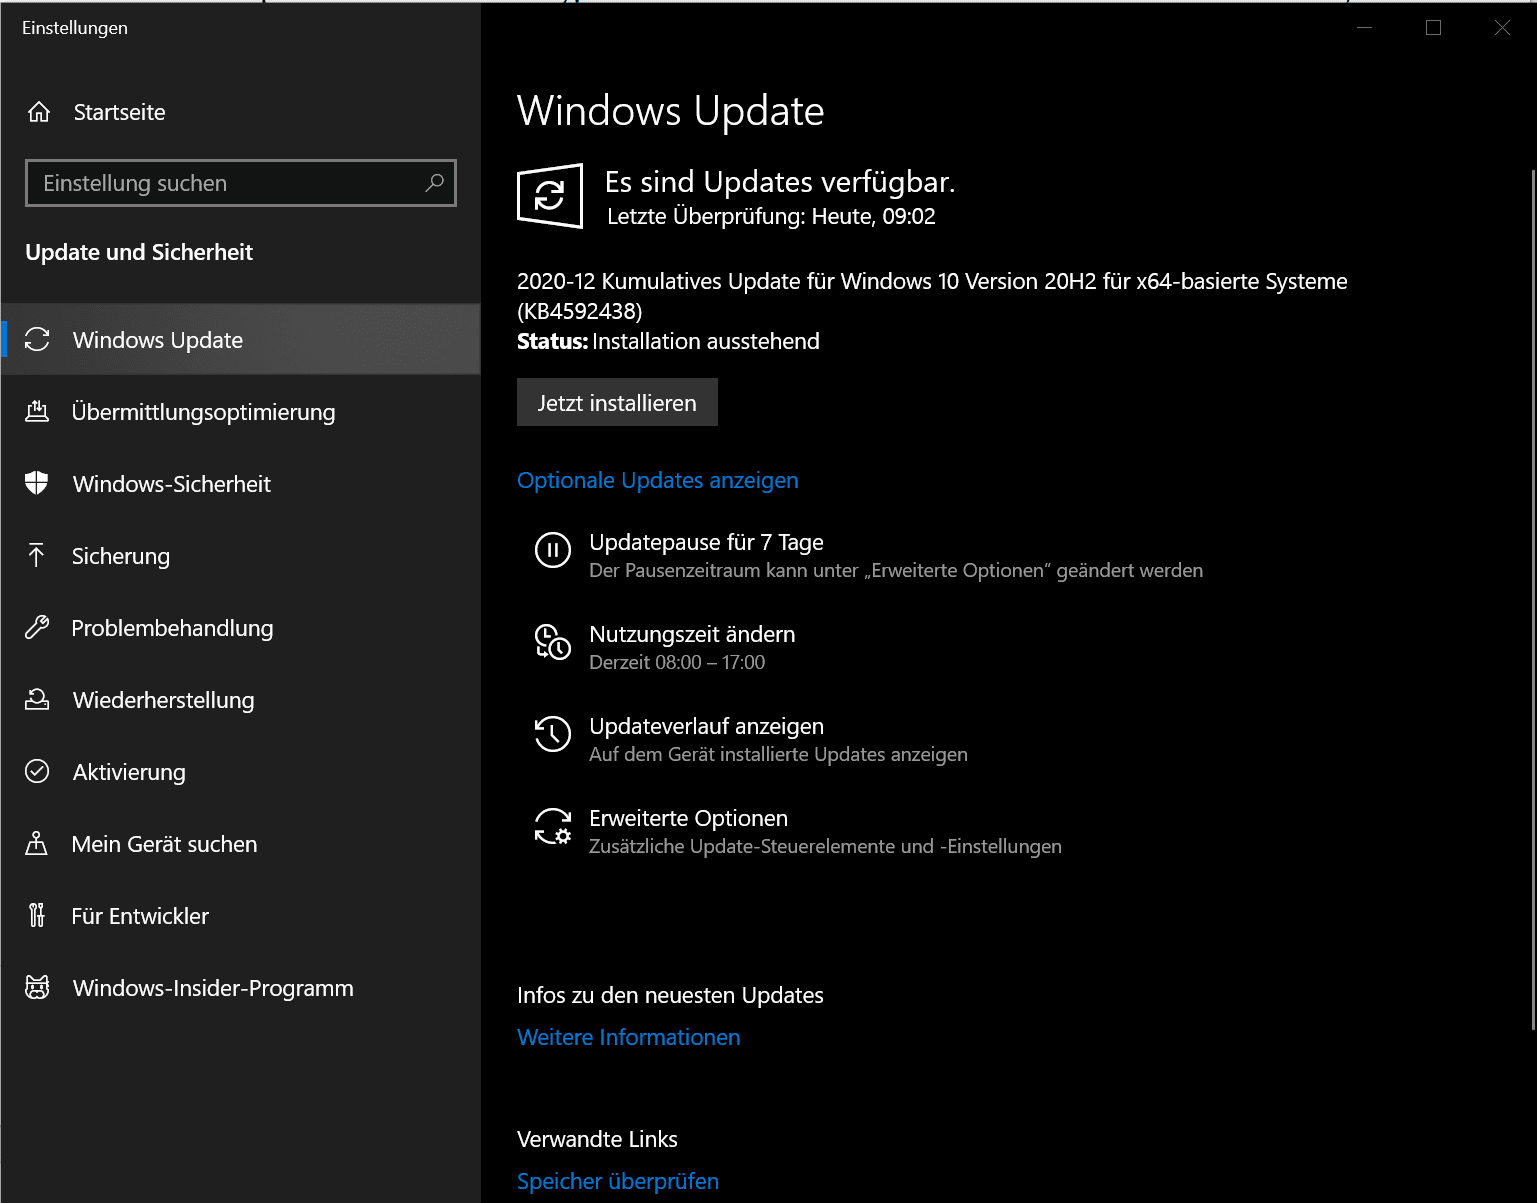 Windows 10 Recording Optimierung Updates